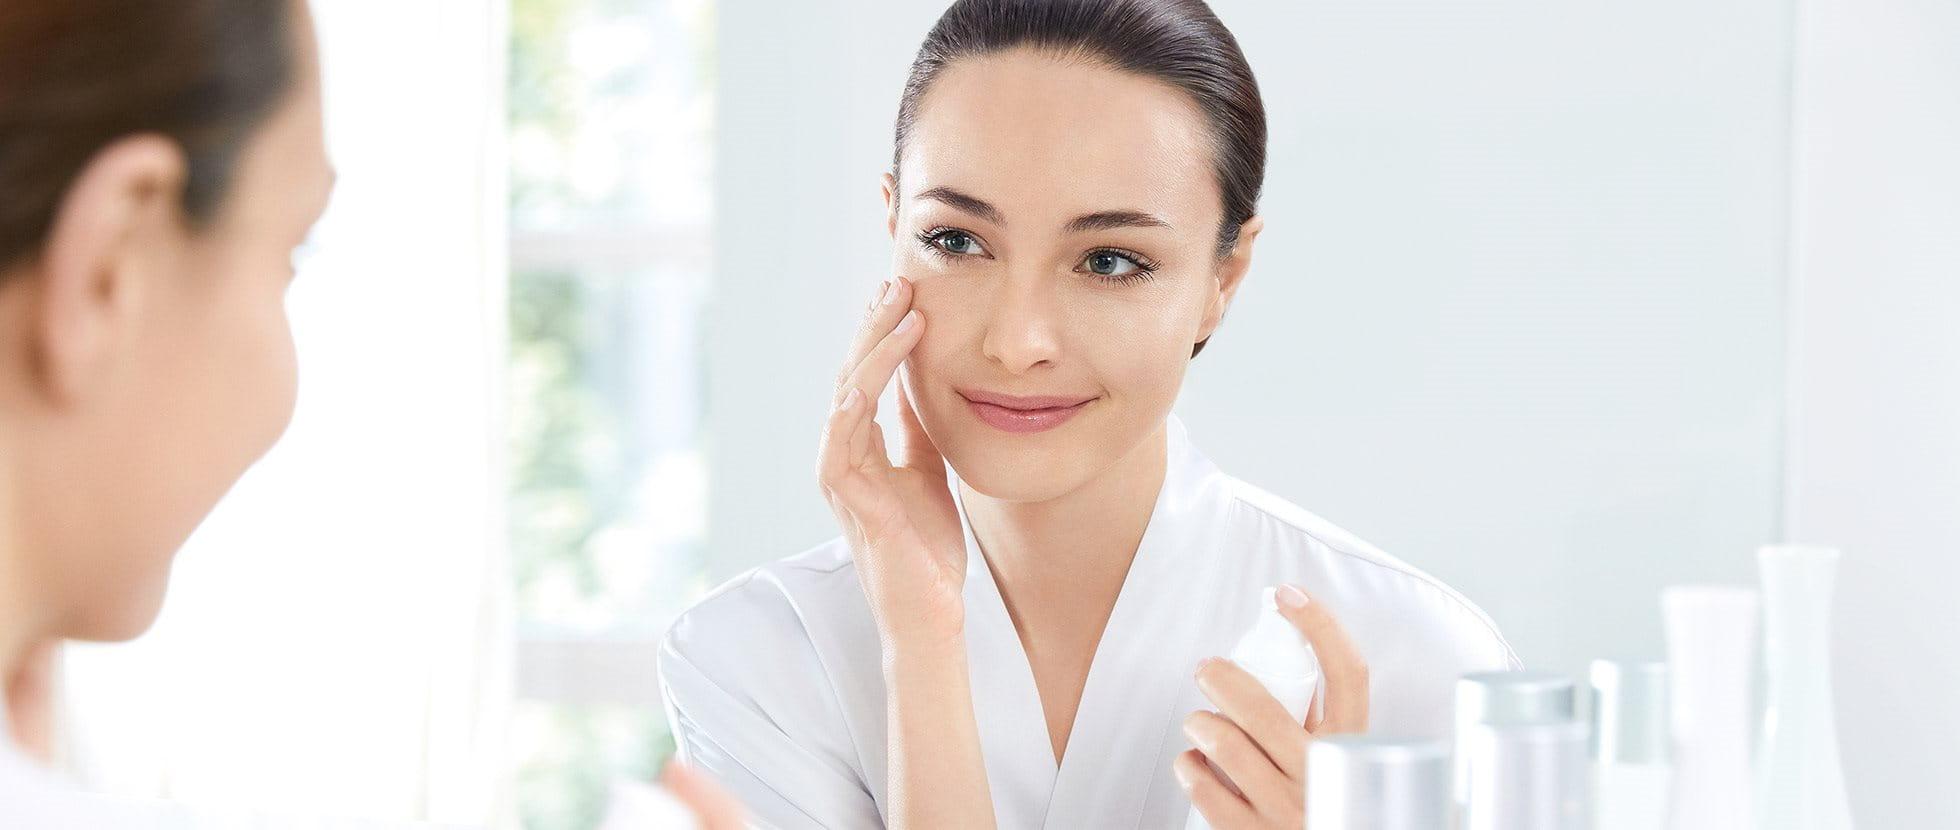 Hyperpigmentation: facial hyperpigmentation